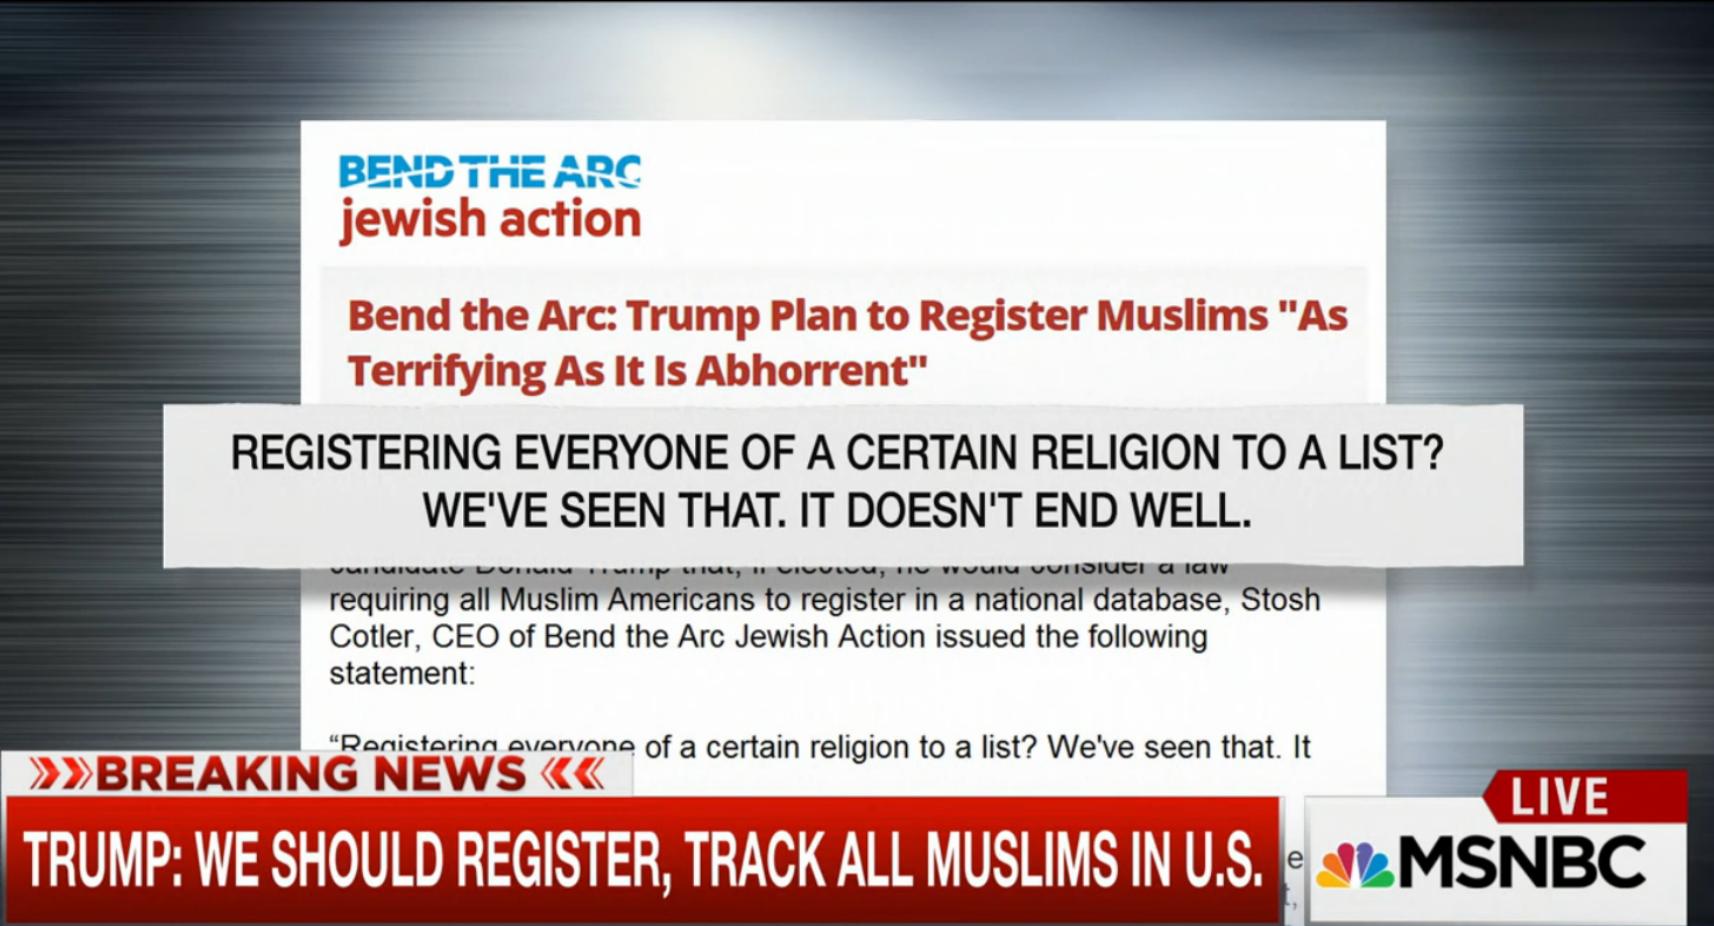 Image Credit: MSNBC.com